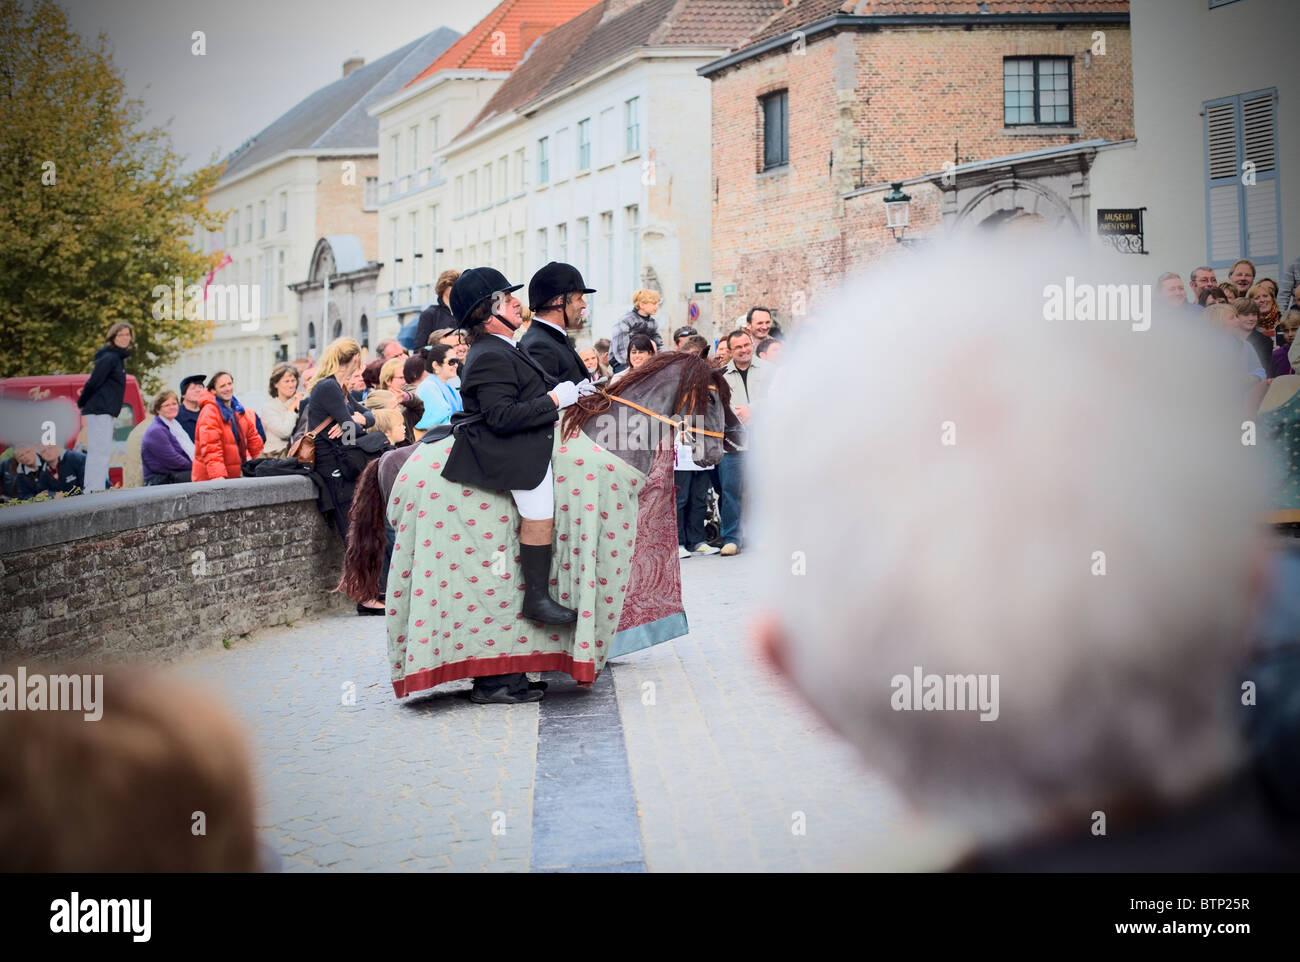 Equestrian Street entertainers, Bruges, Belgium, Europe - Stock Image